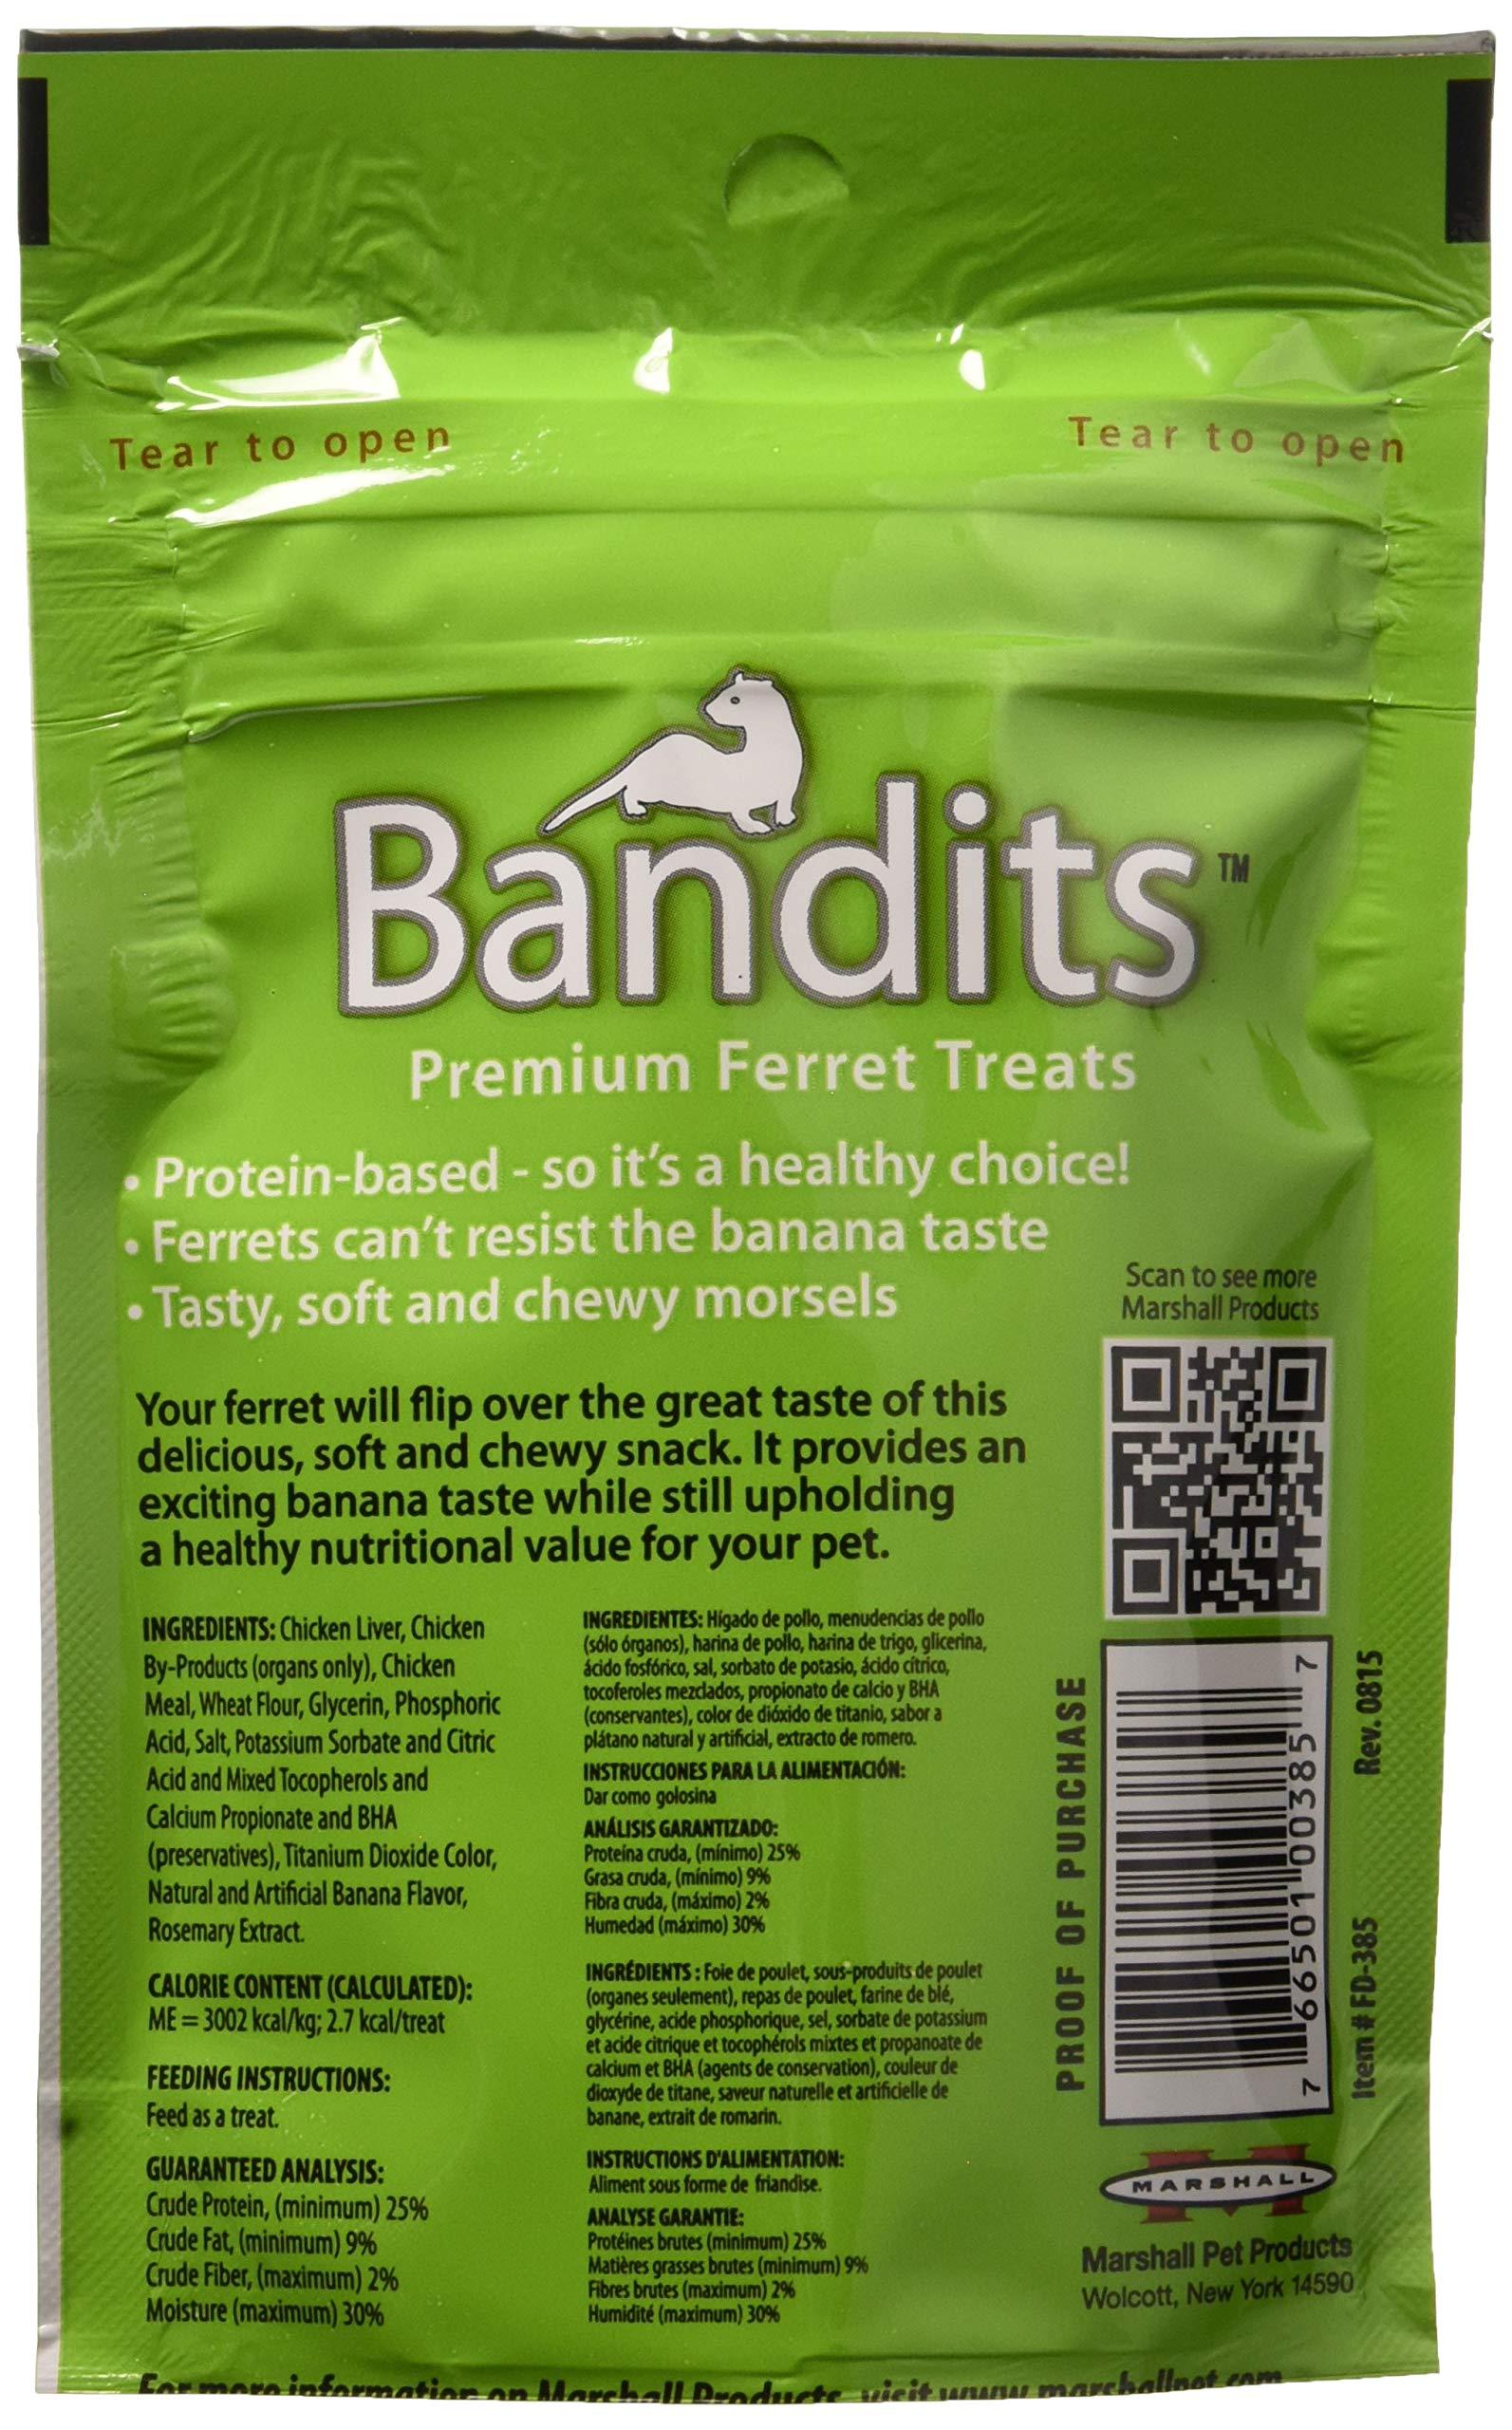 Marshall Bandits Ferret Treat Banana 1.875lbs (10 x 3oz) by Marshall (Image #4)